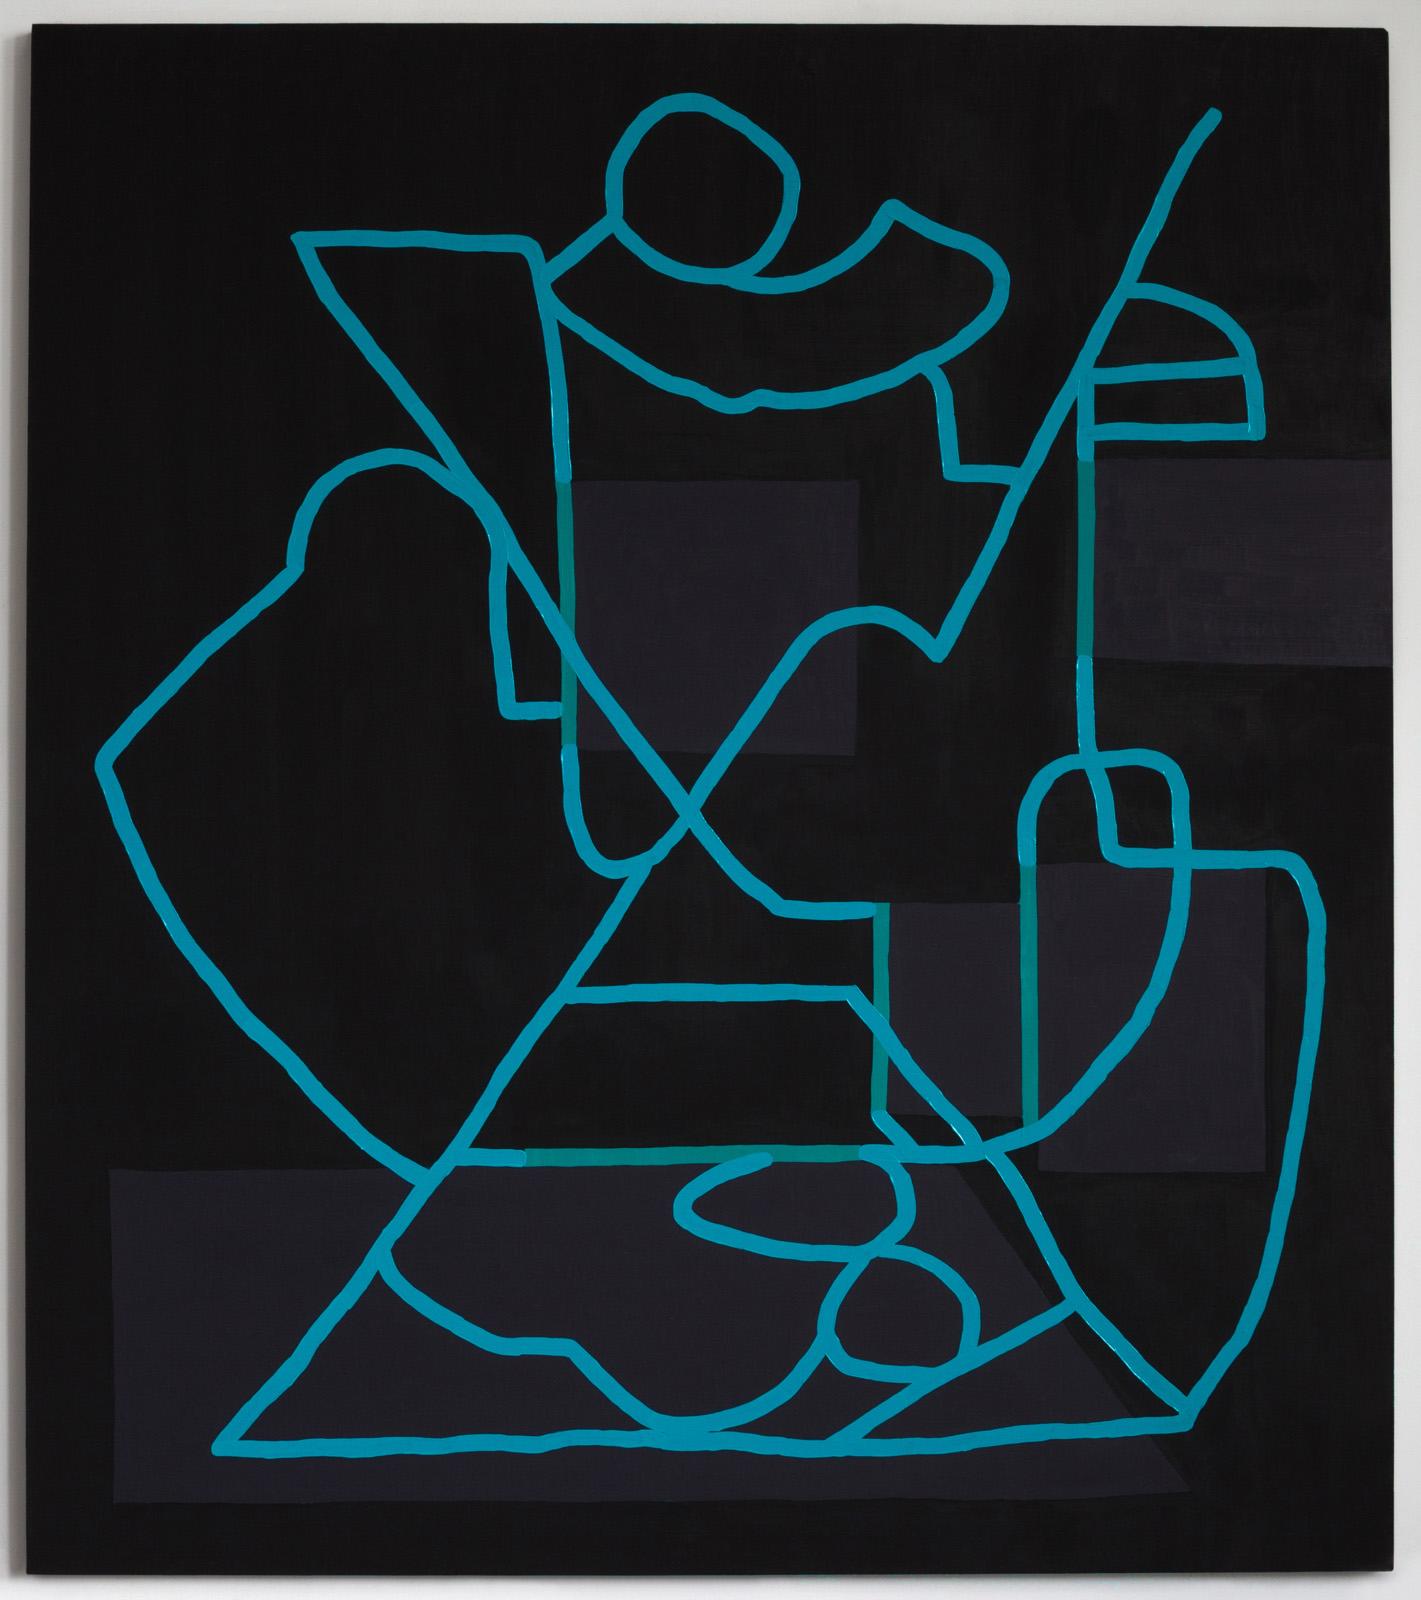 O.T., 168 x 147 cm, 2017